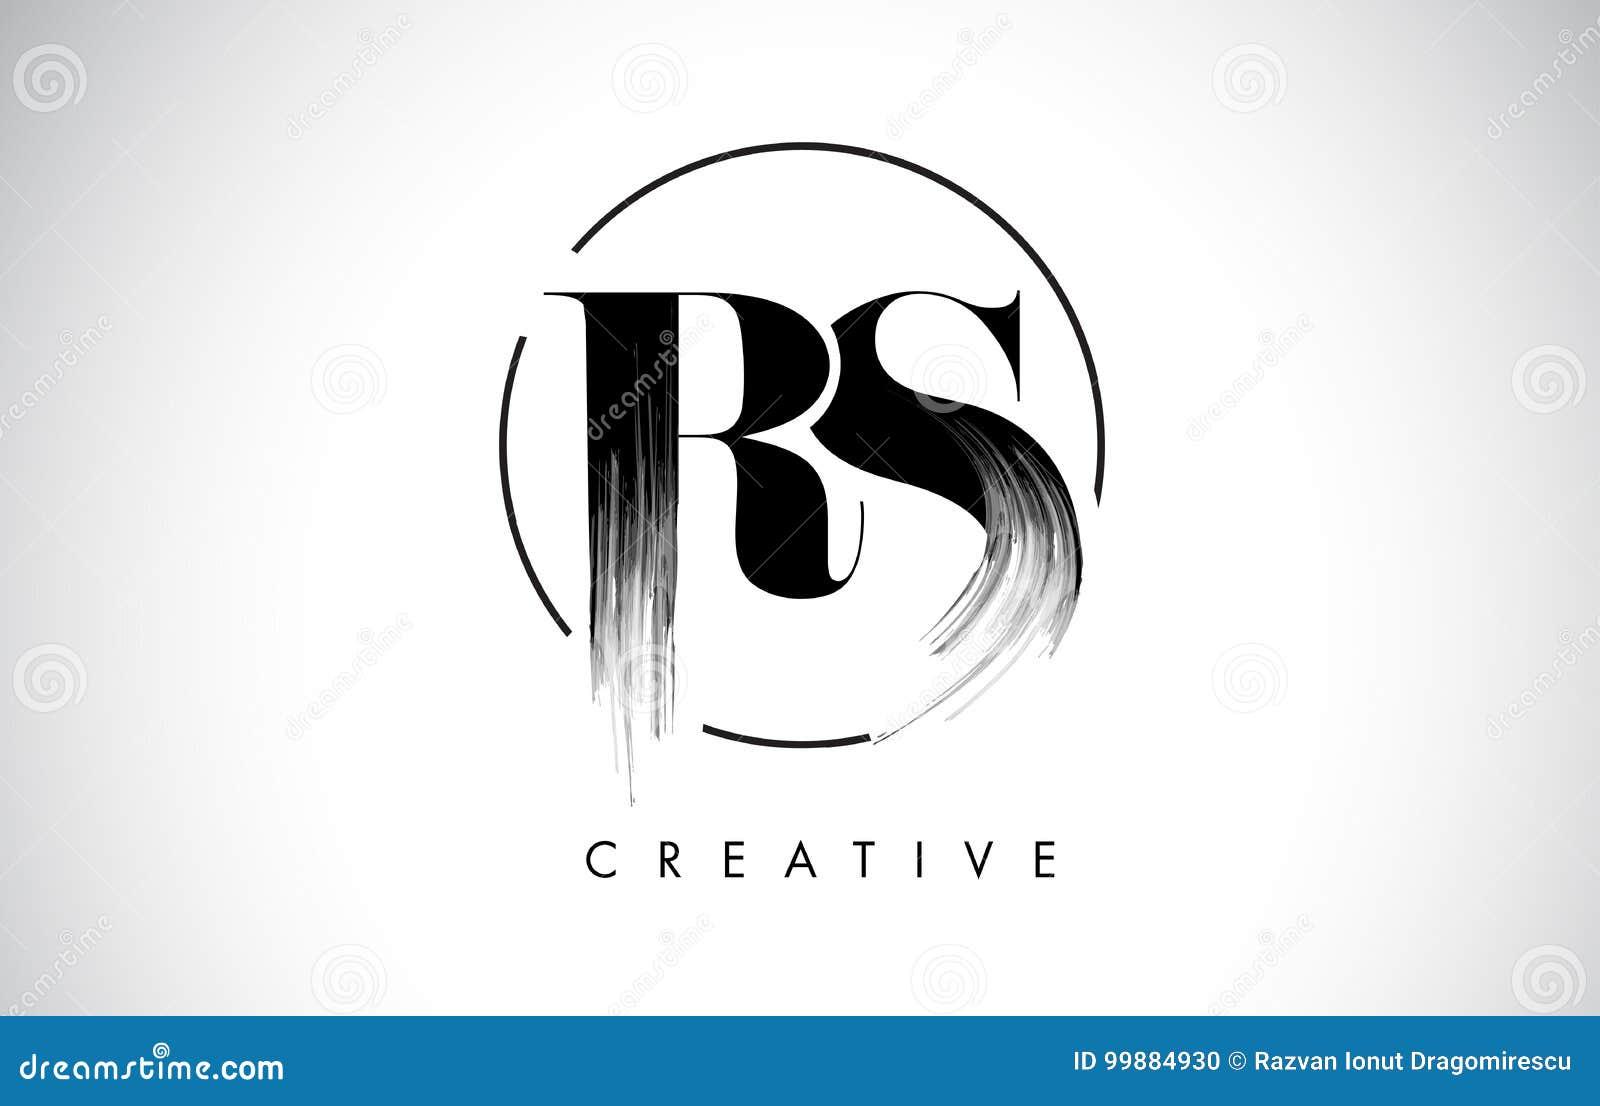 Rs brush stroke letter logo design black paint logo leters icon rs brush stroke letter logo design black paint logo leters icon buycottarizona Image collections